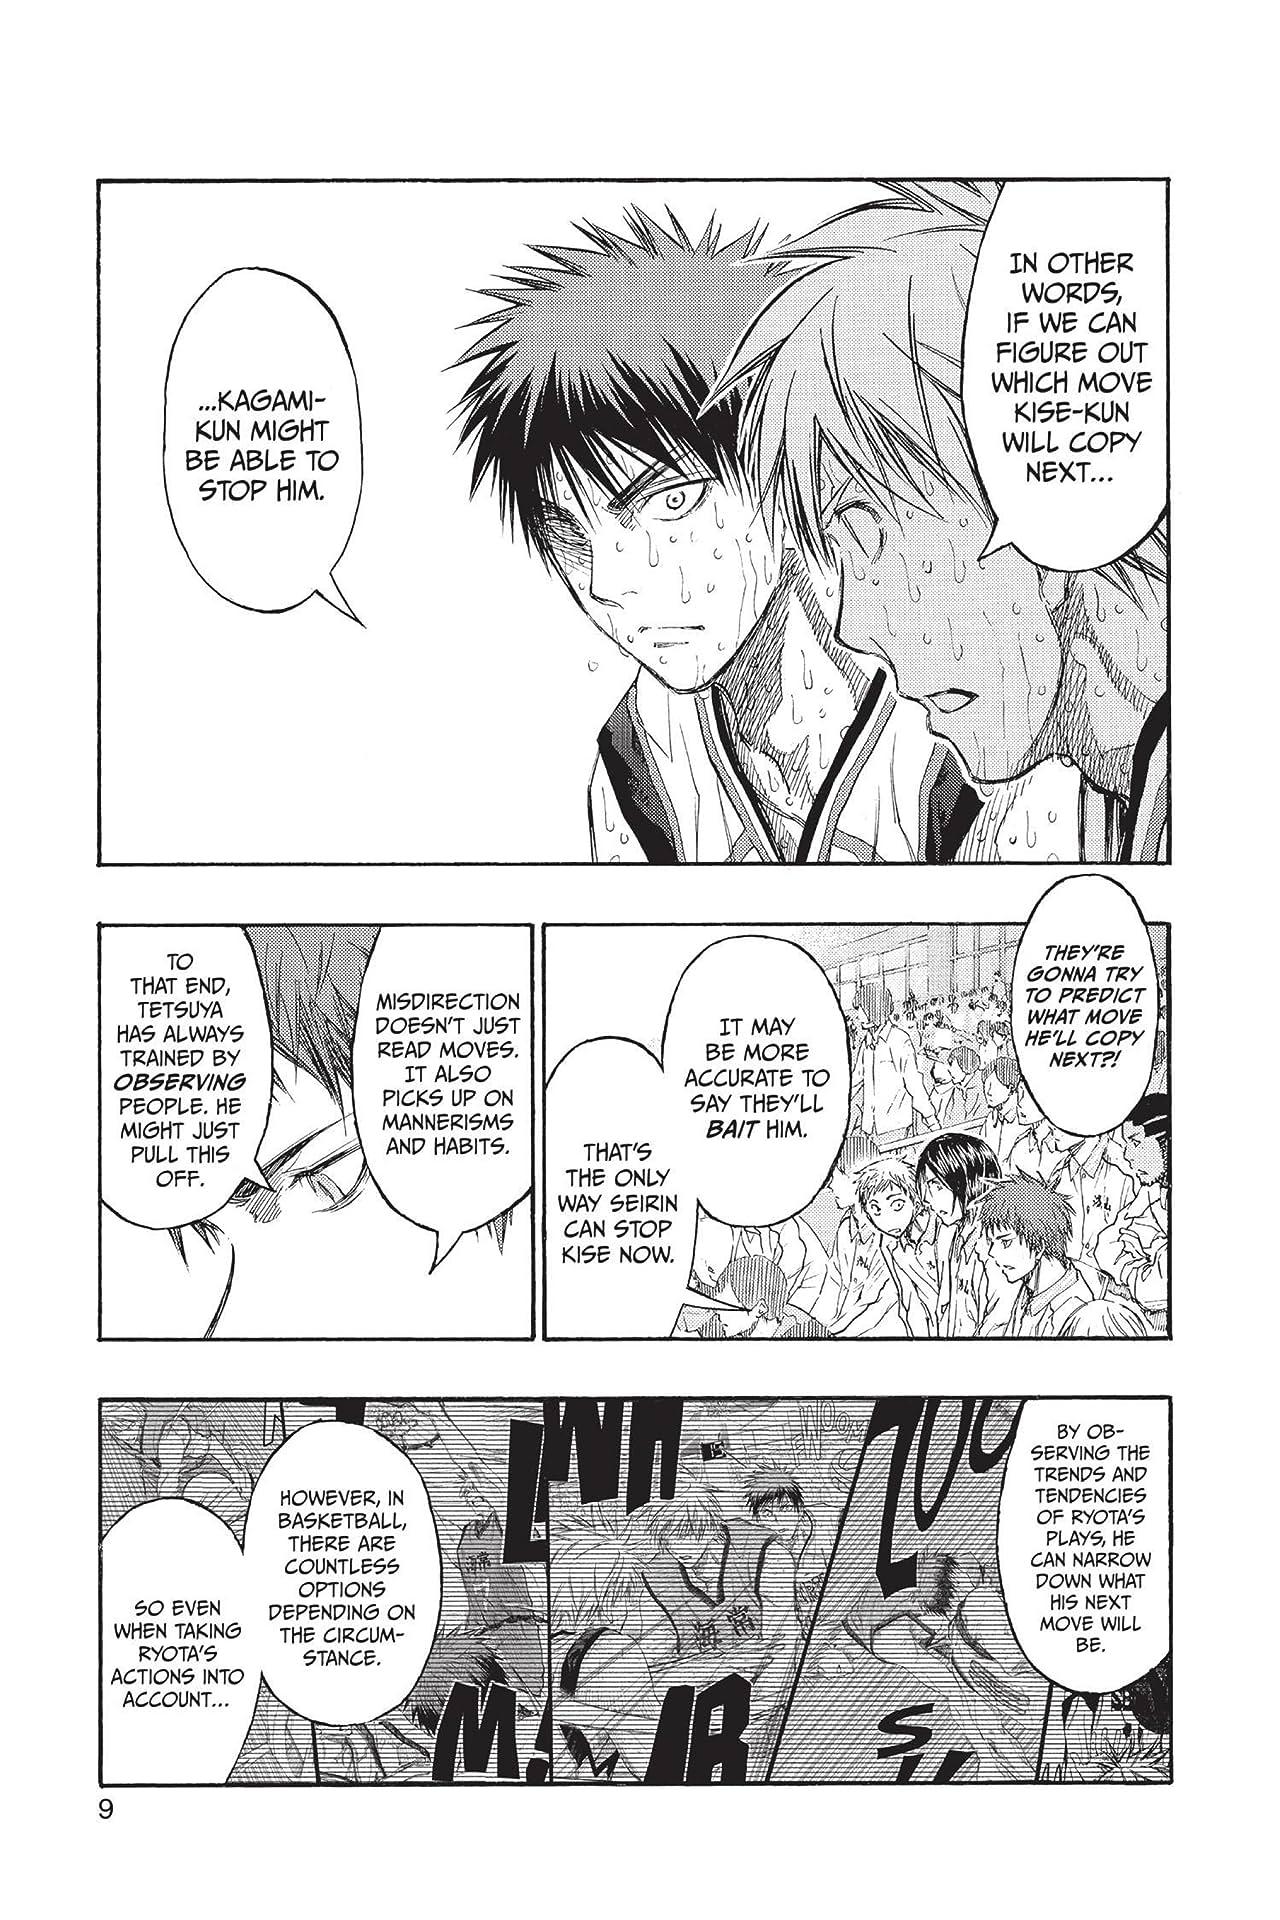 Kuroko's Basketball Vol. 12